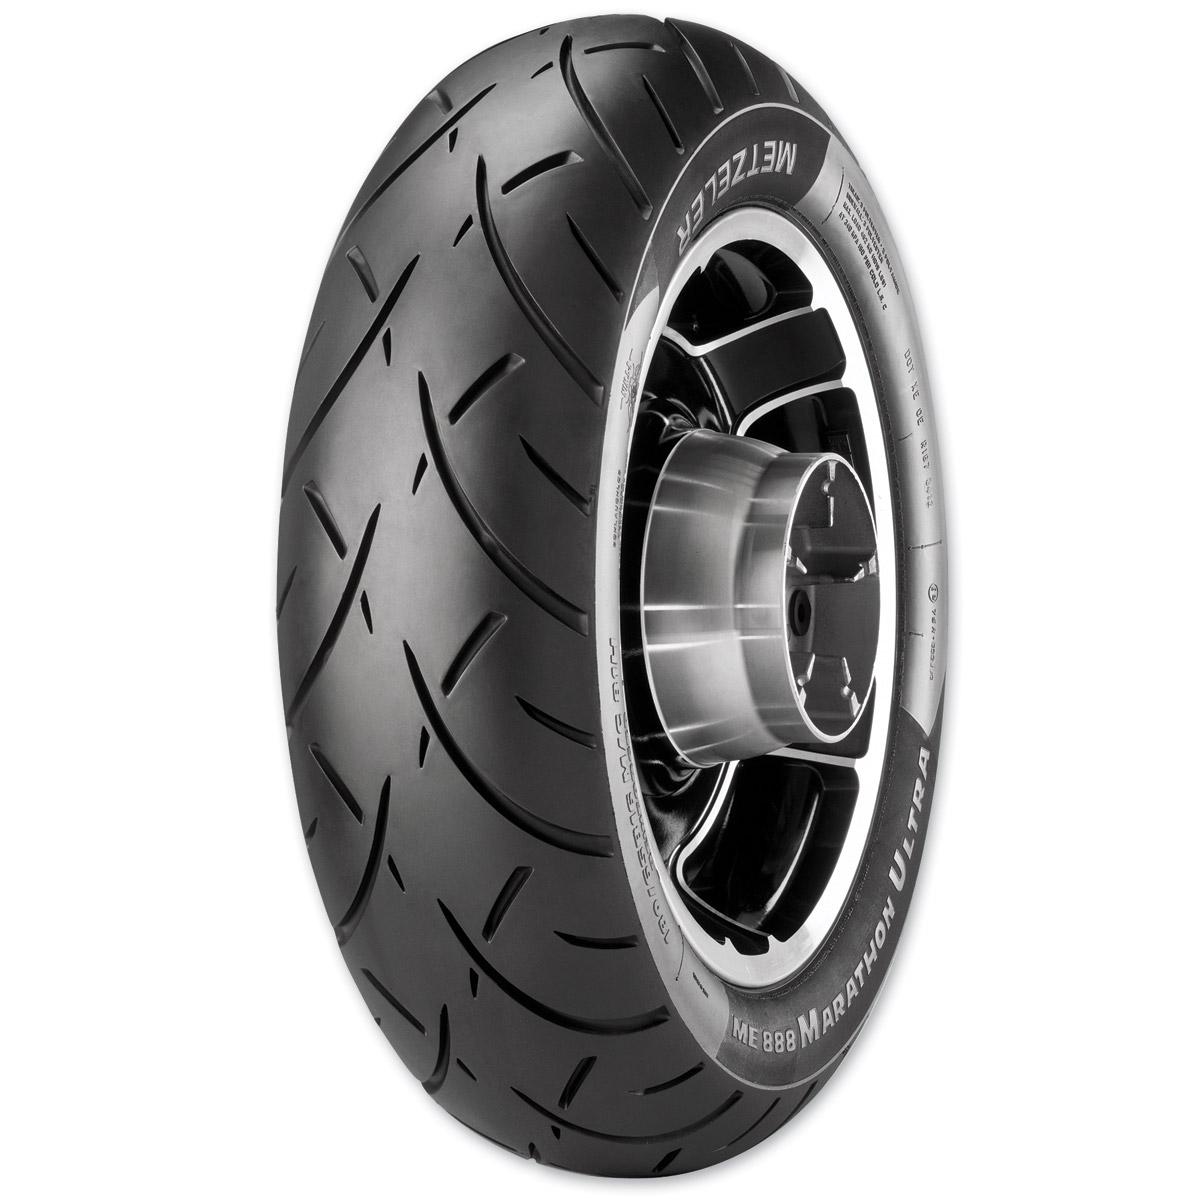 Metzeler ME888 Marathon Ultra MU85B16 Rear Tire